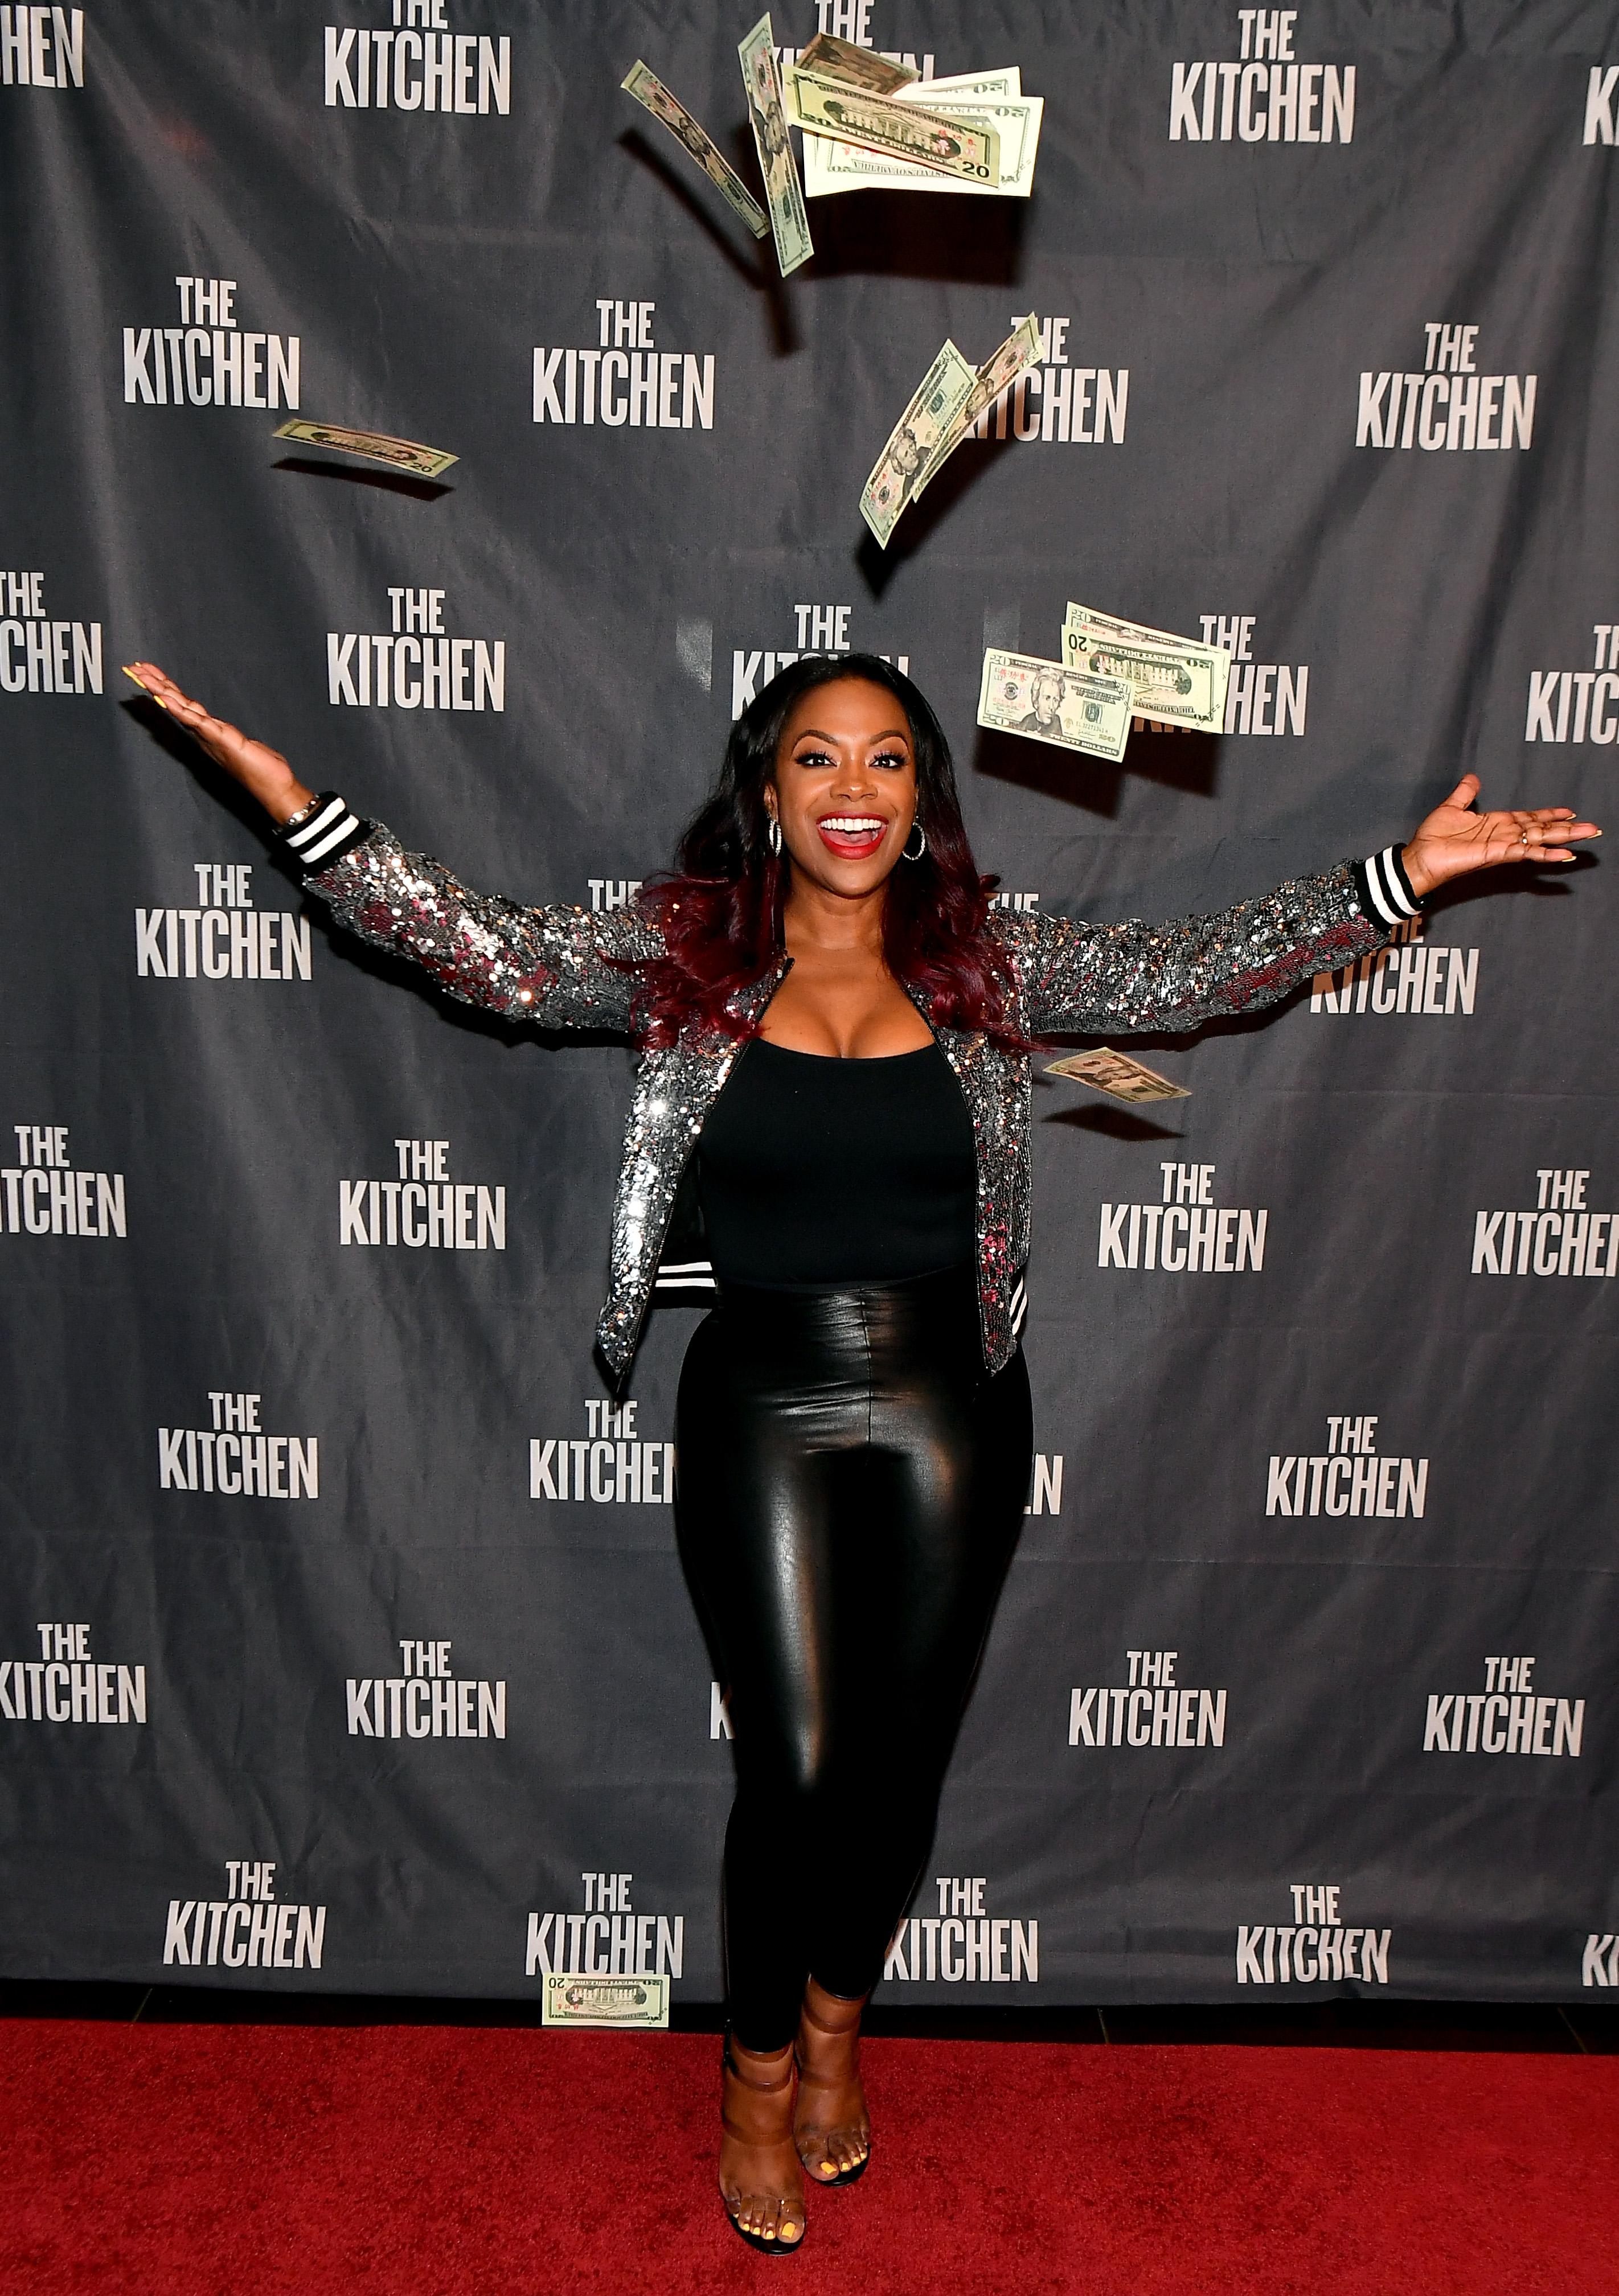 Kandi Burruss Hosts Atlanta Screening For WB 's 'The Kitchen'